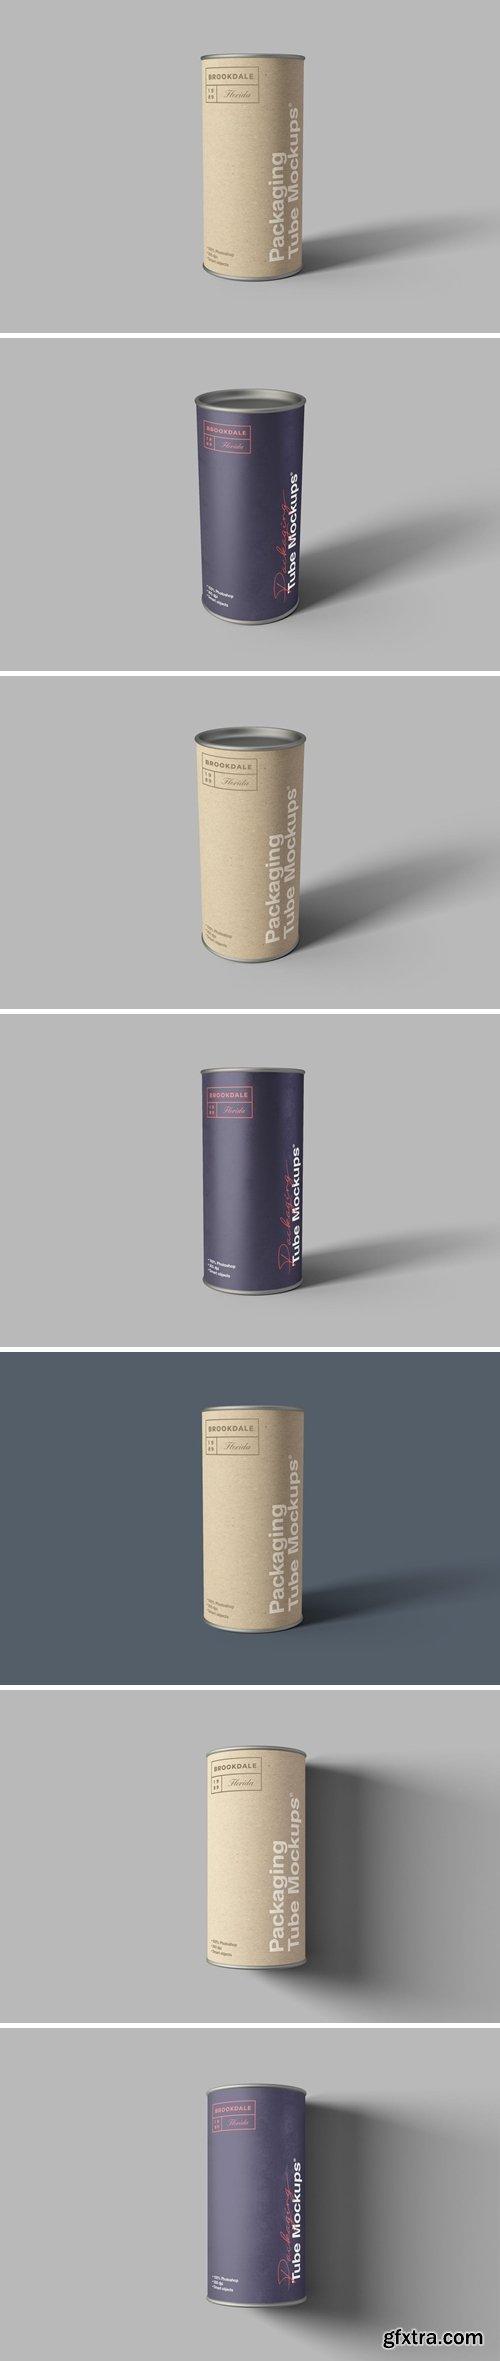 Packaging Tube Mockups